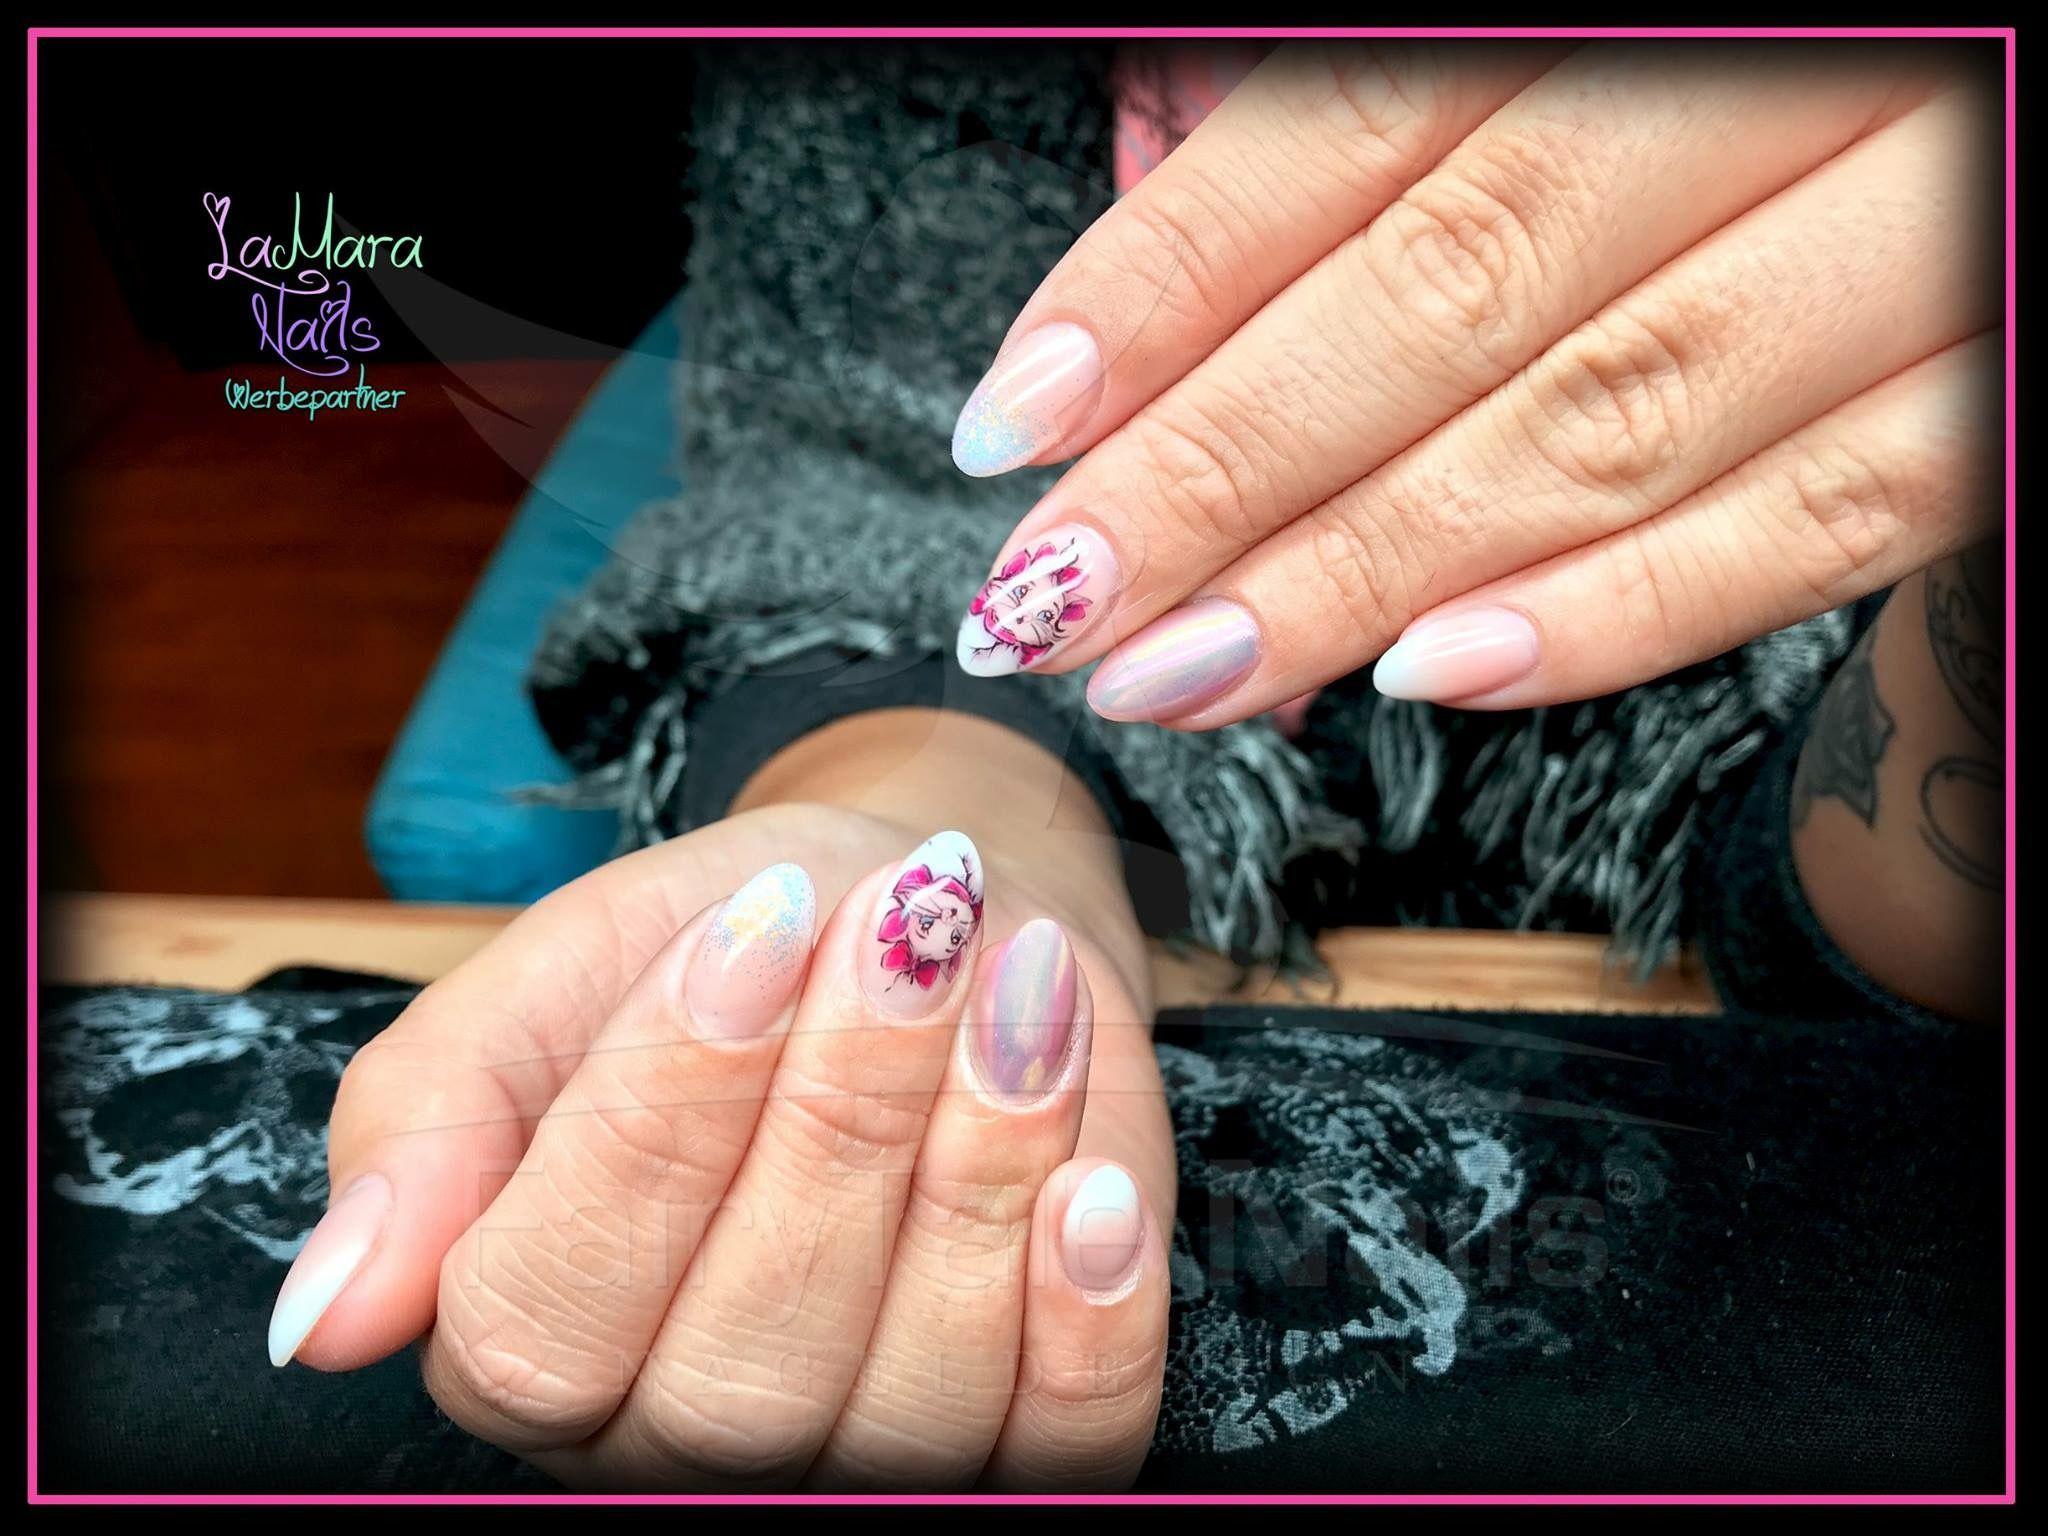 Nageldesign Nails Nailart Crazynails Airbrush Nägel | FairyTale ...